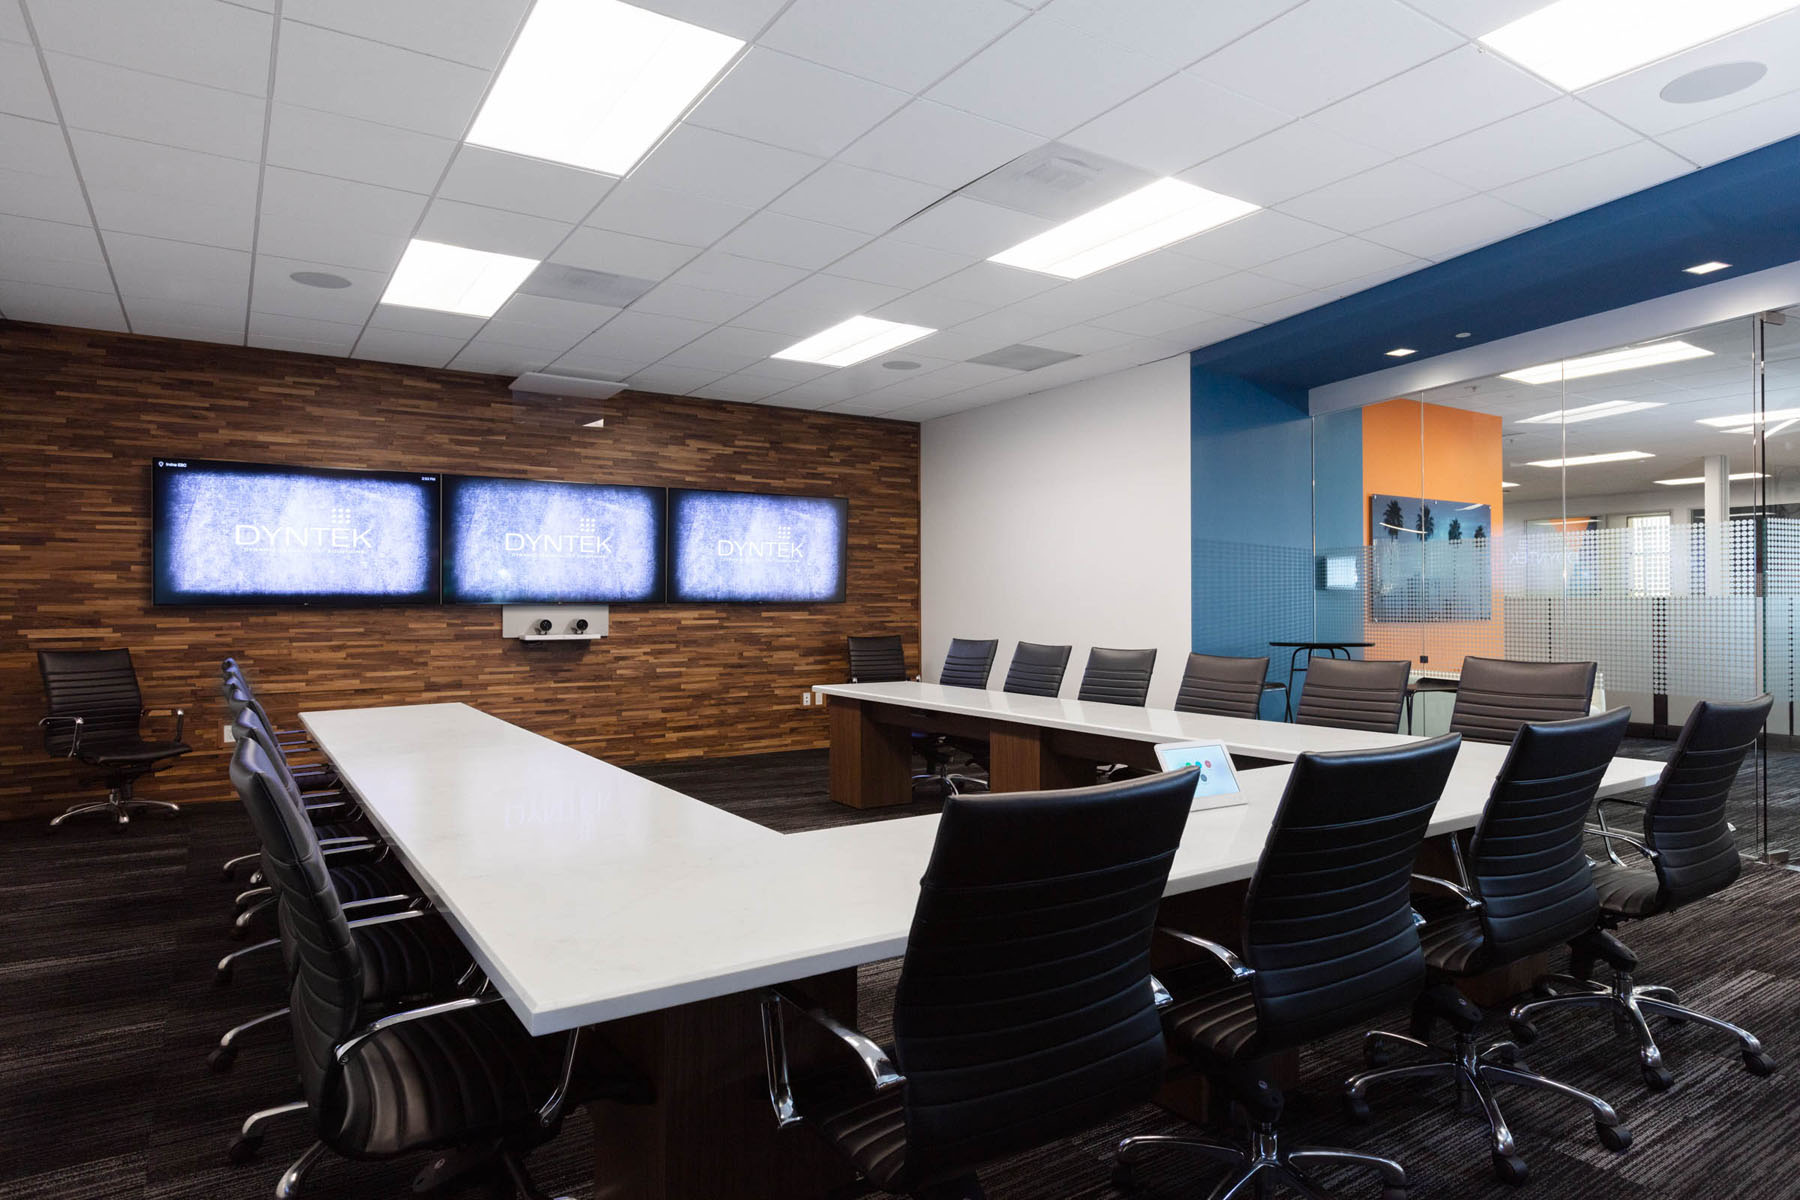 DynTek Corporate Headquarters